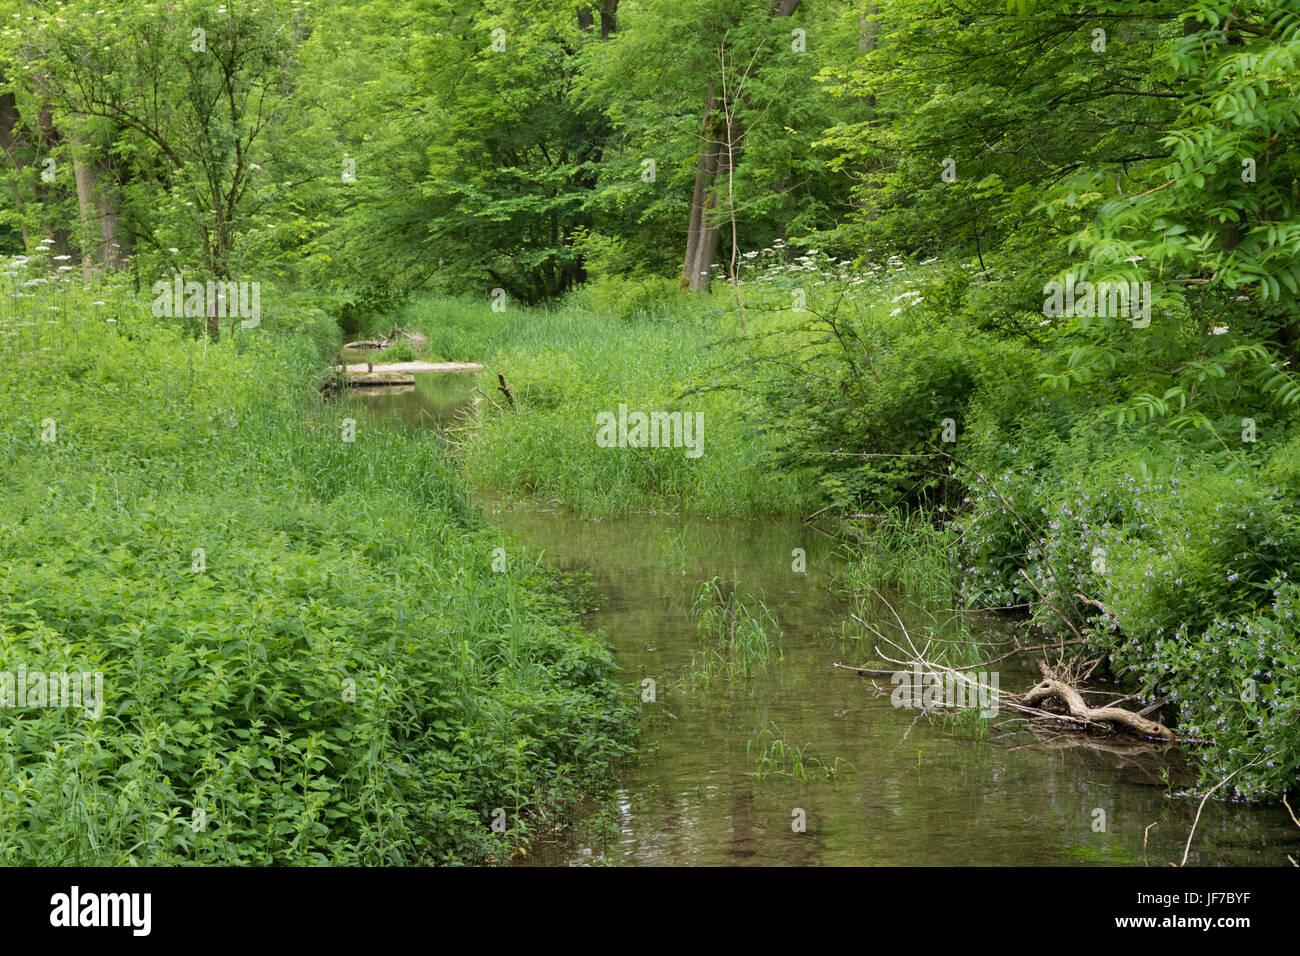 üppige Frühsommer Vegetation am Rande der Fluß Lathkill in der Peak District National Park, UK Stockbild